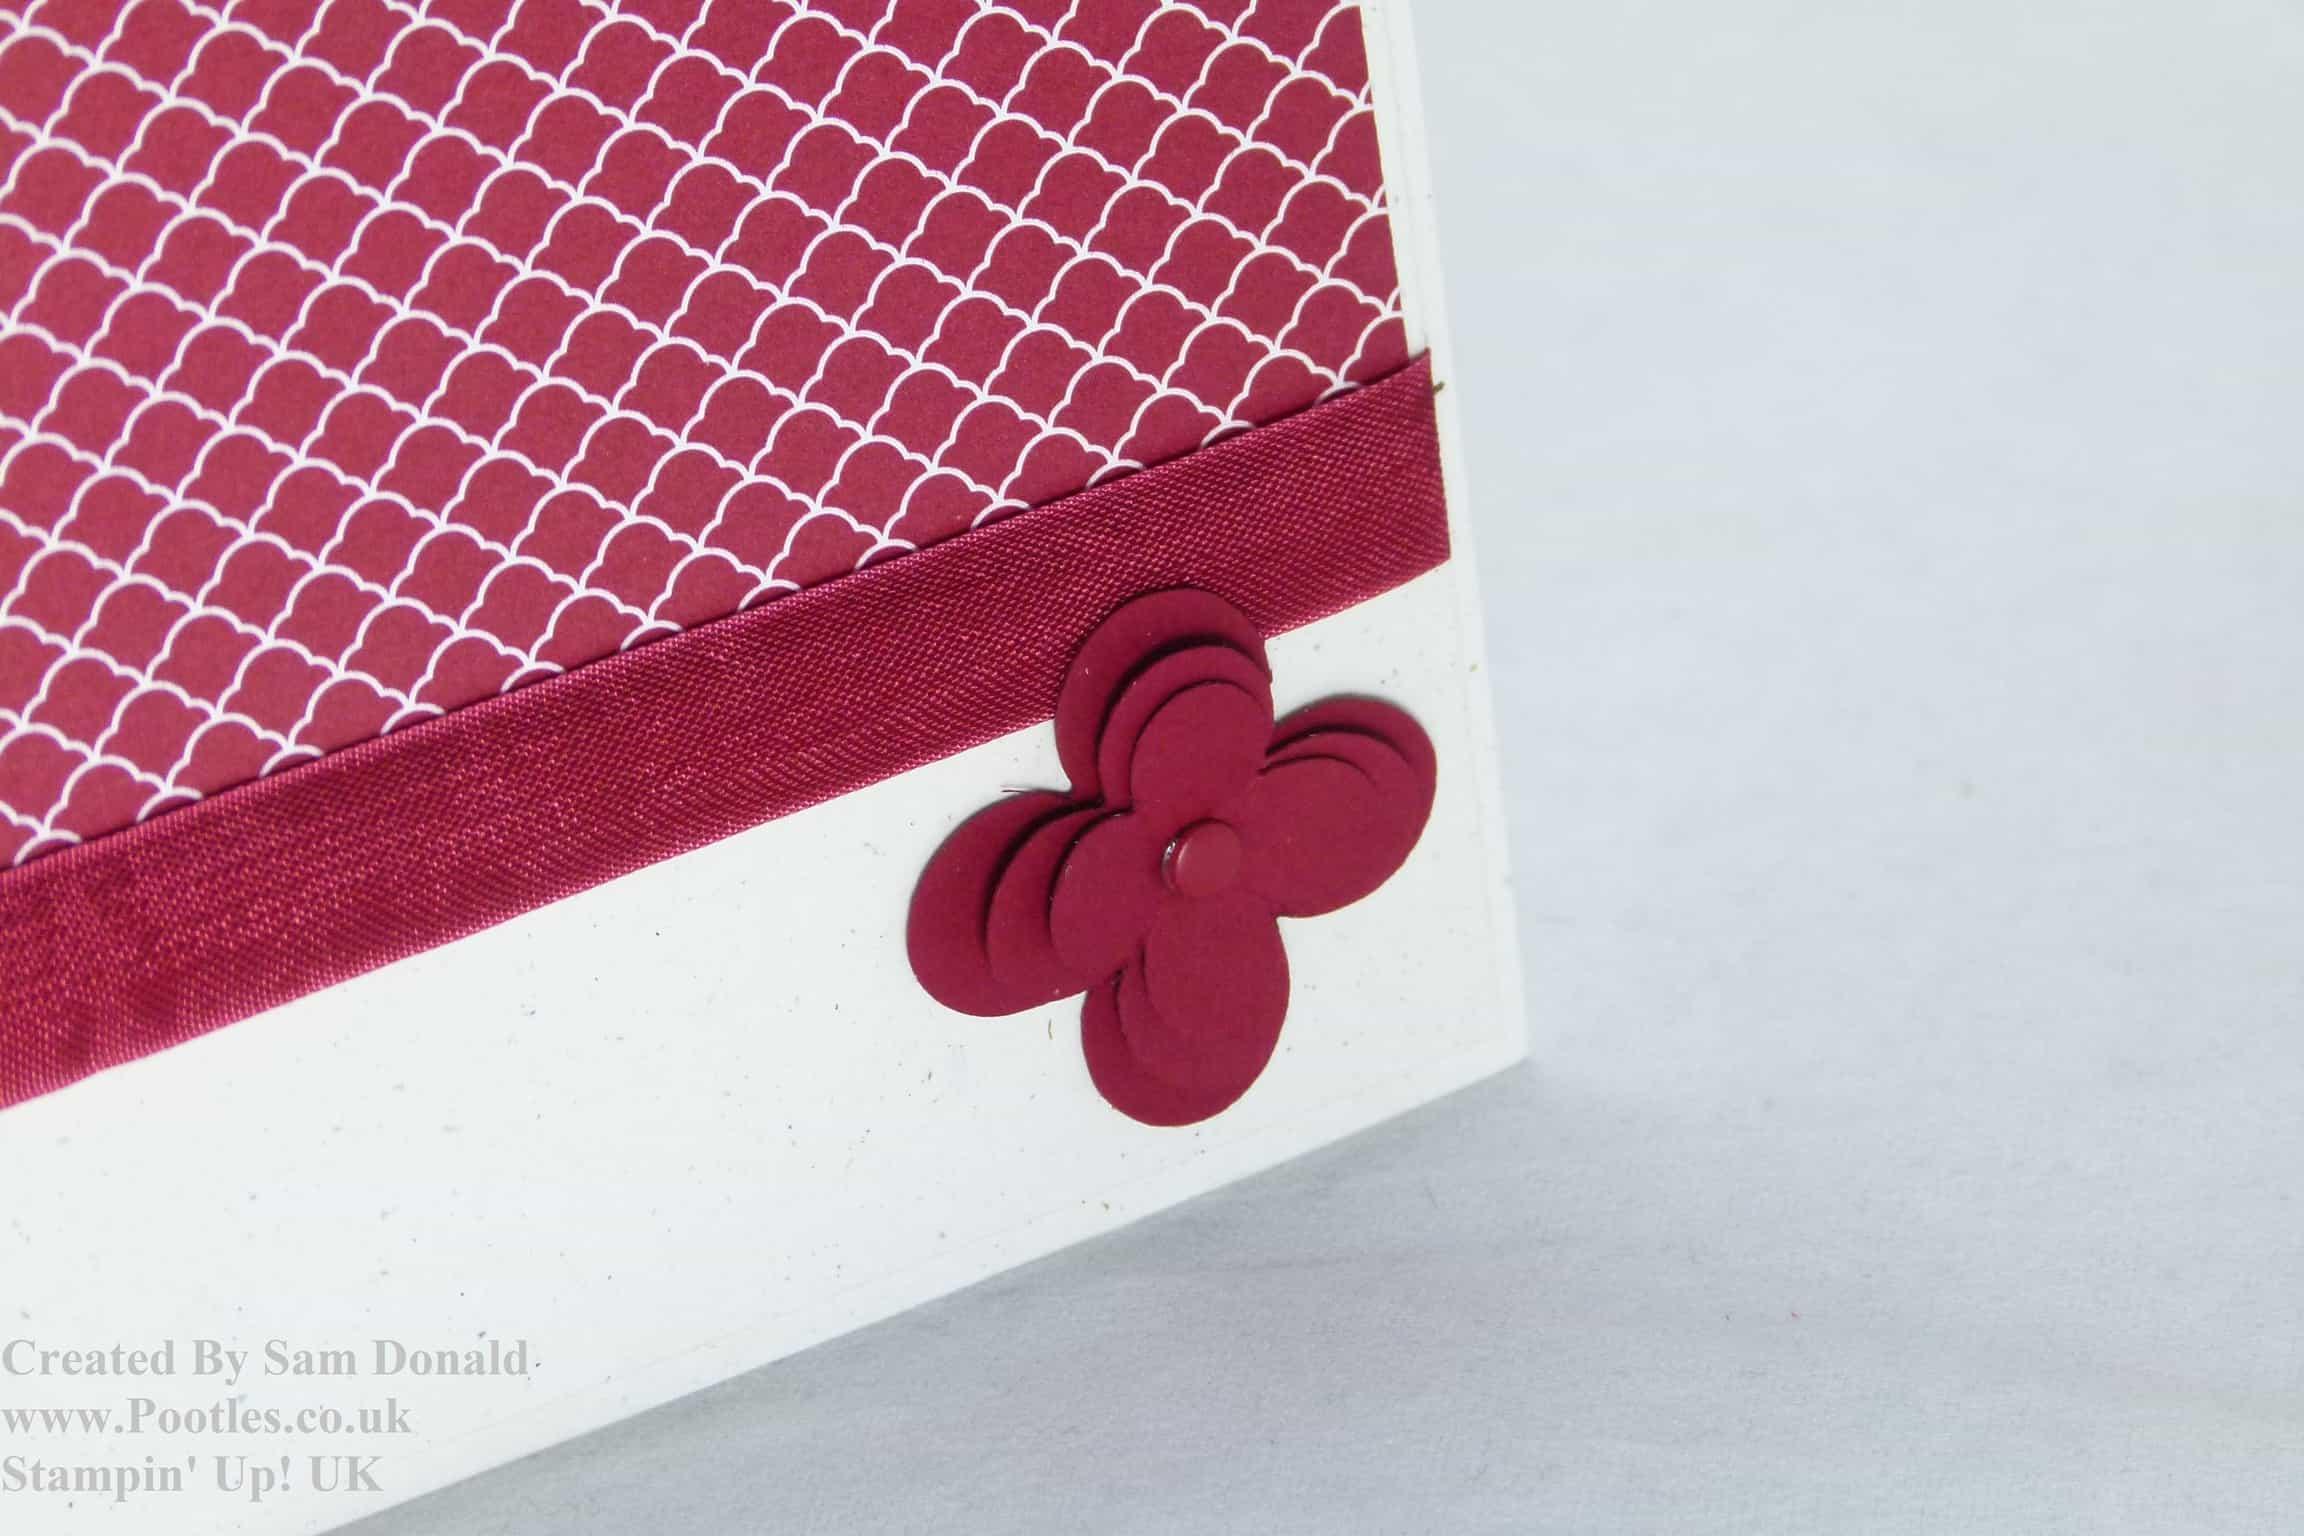 Pootles Stampin Up UK Cherry Cobbler Showcase